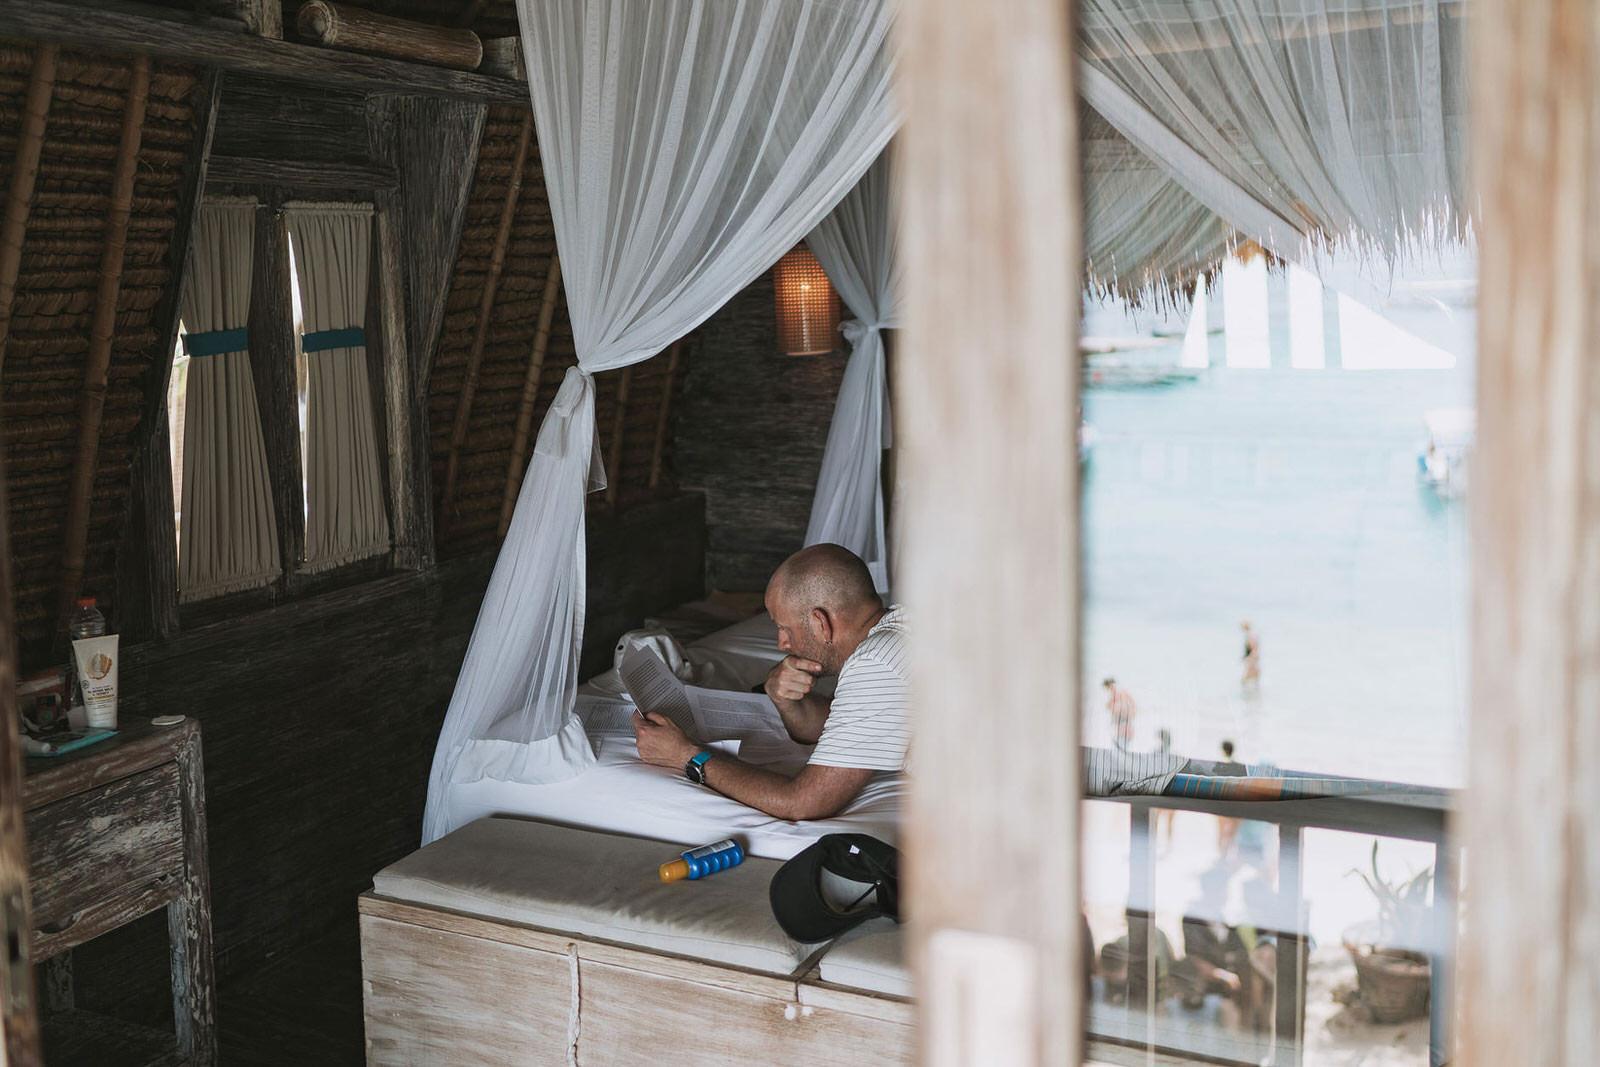 newfound-hai-tide-nusa-lembongan-bali-wedding-photographers-066